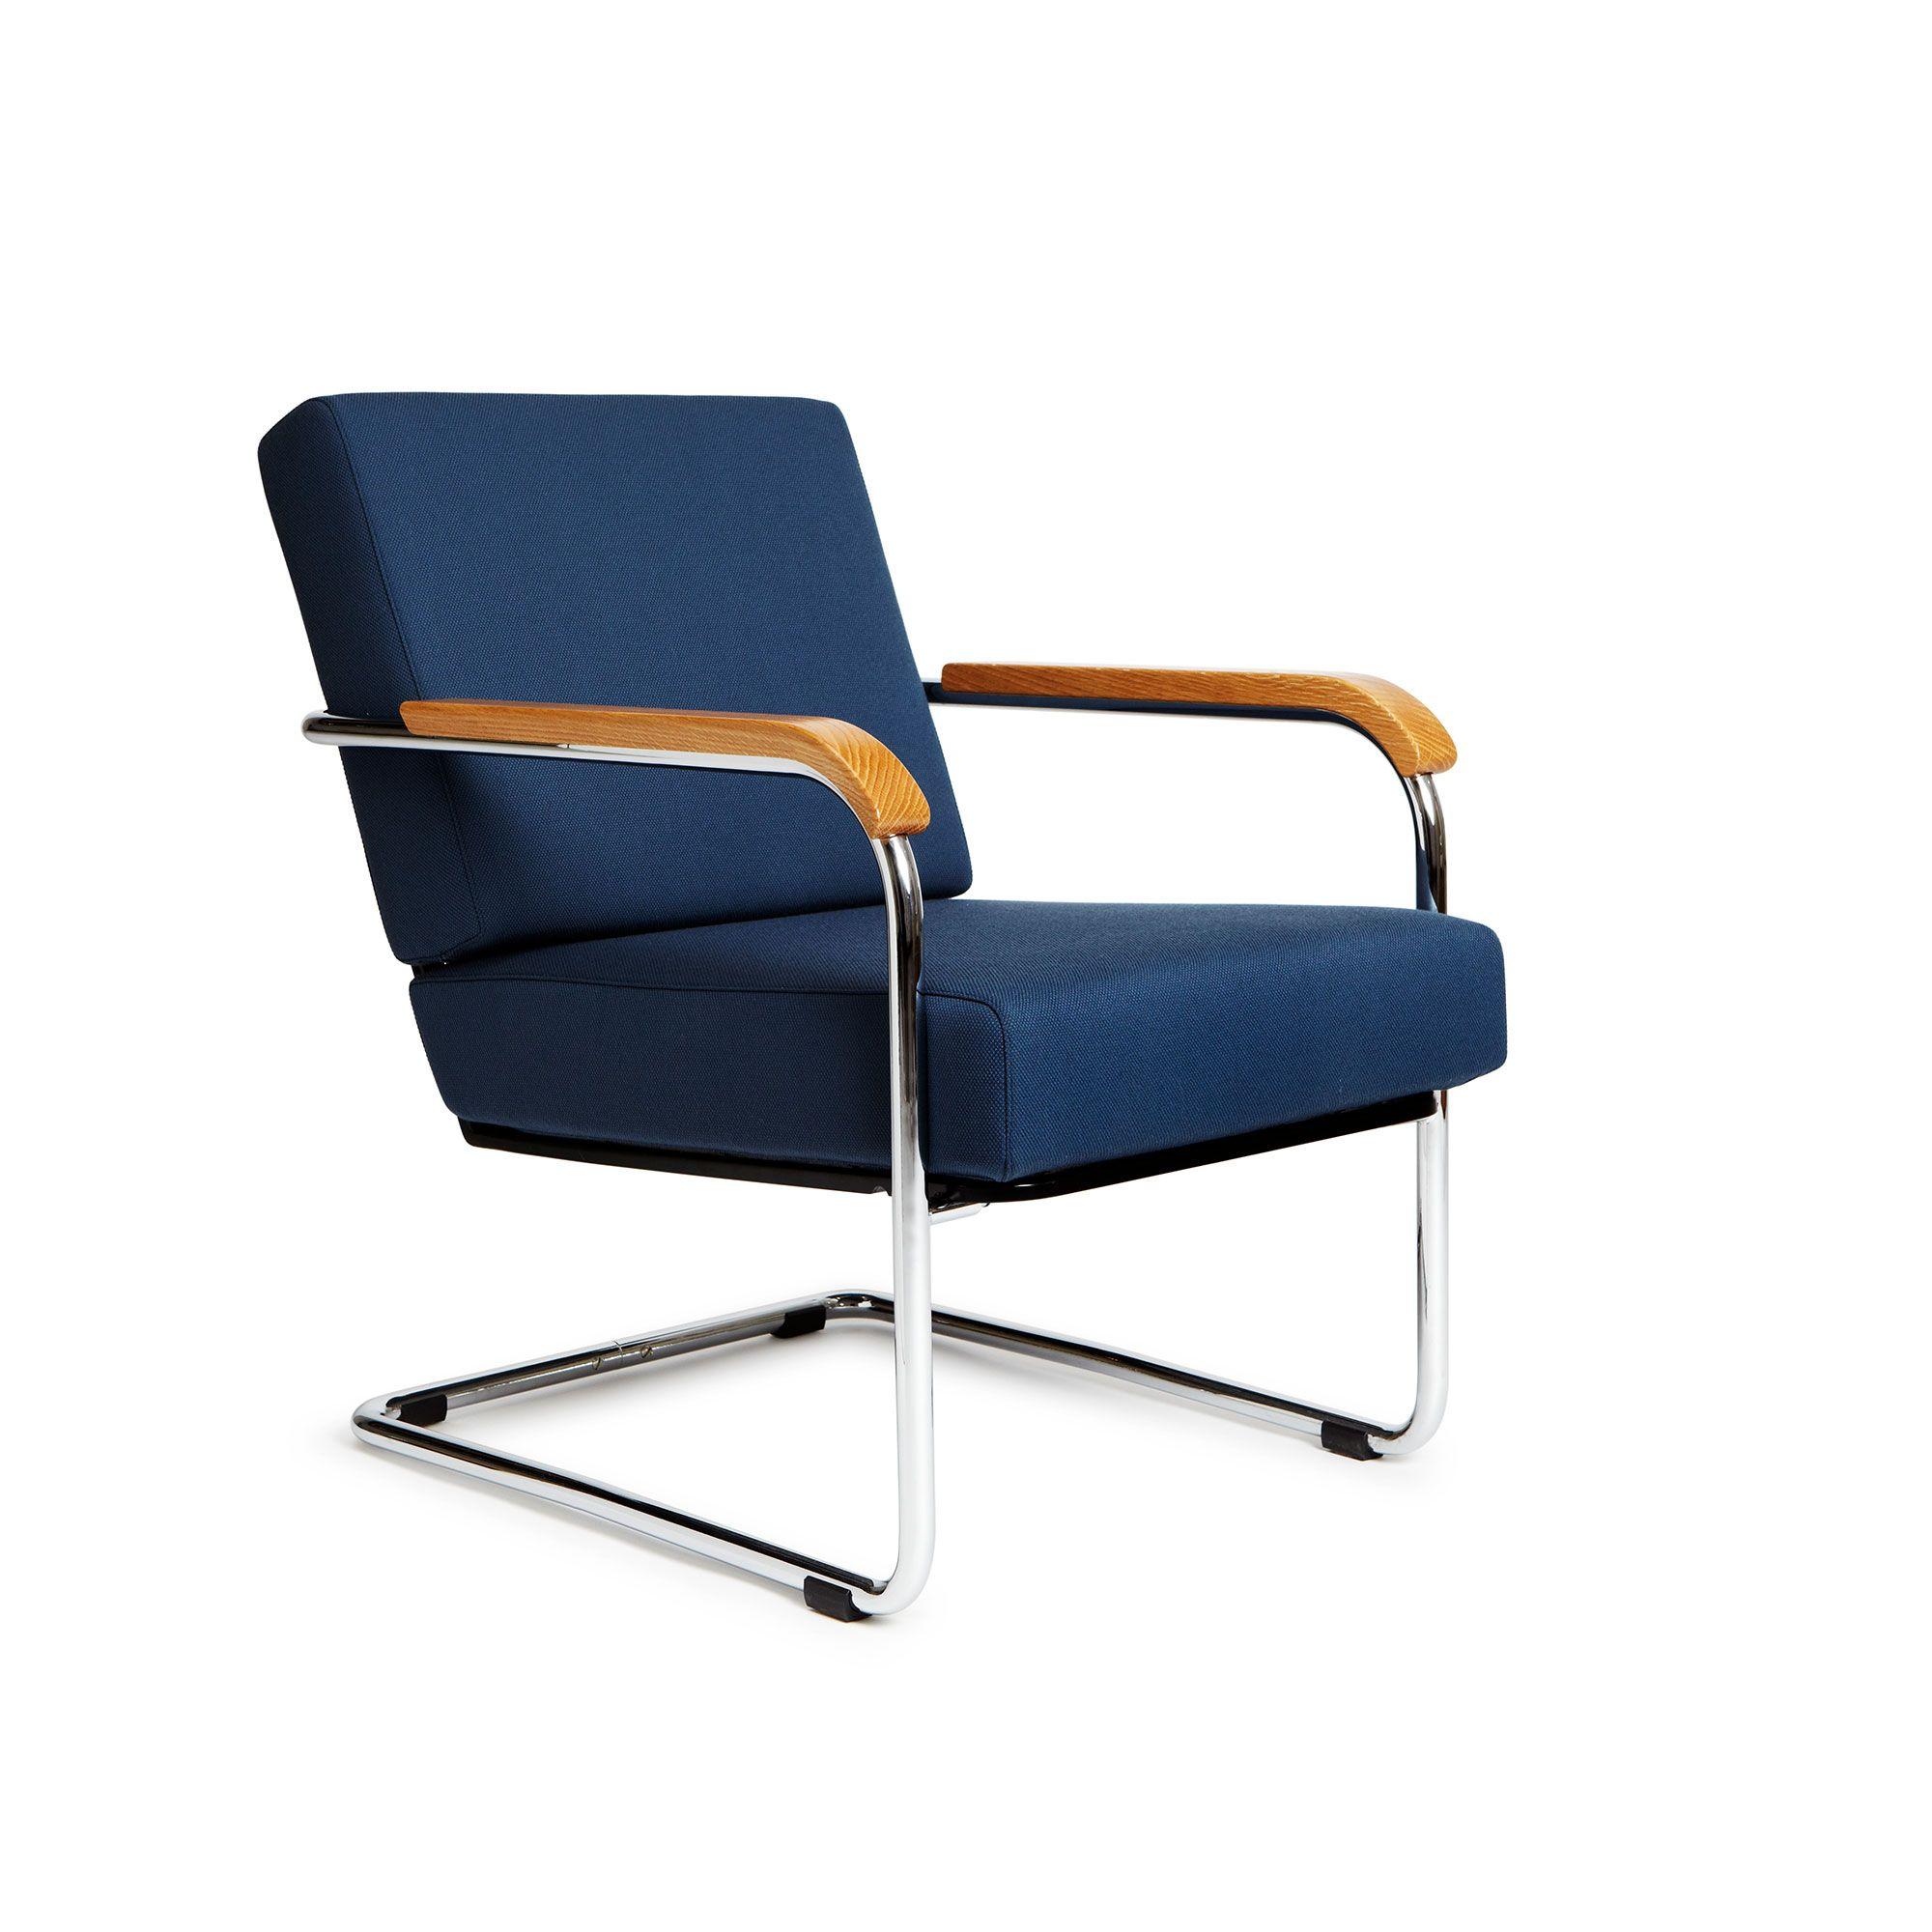 omode-schweiz-möbel-zuhause-polstermöbel-designklassiker-embru-moserfauteuil-(3)